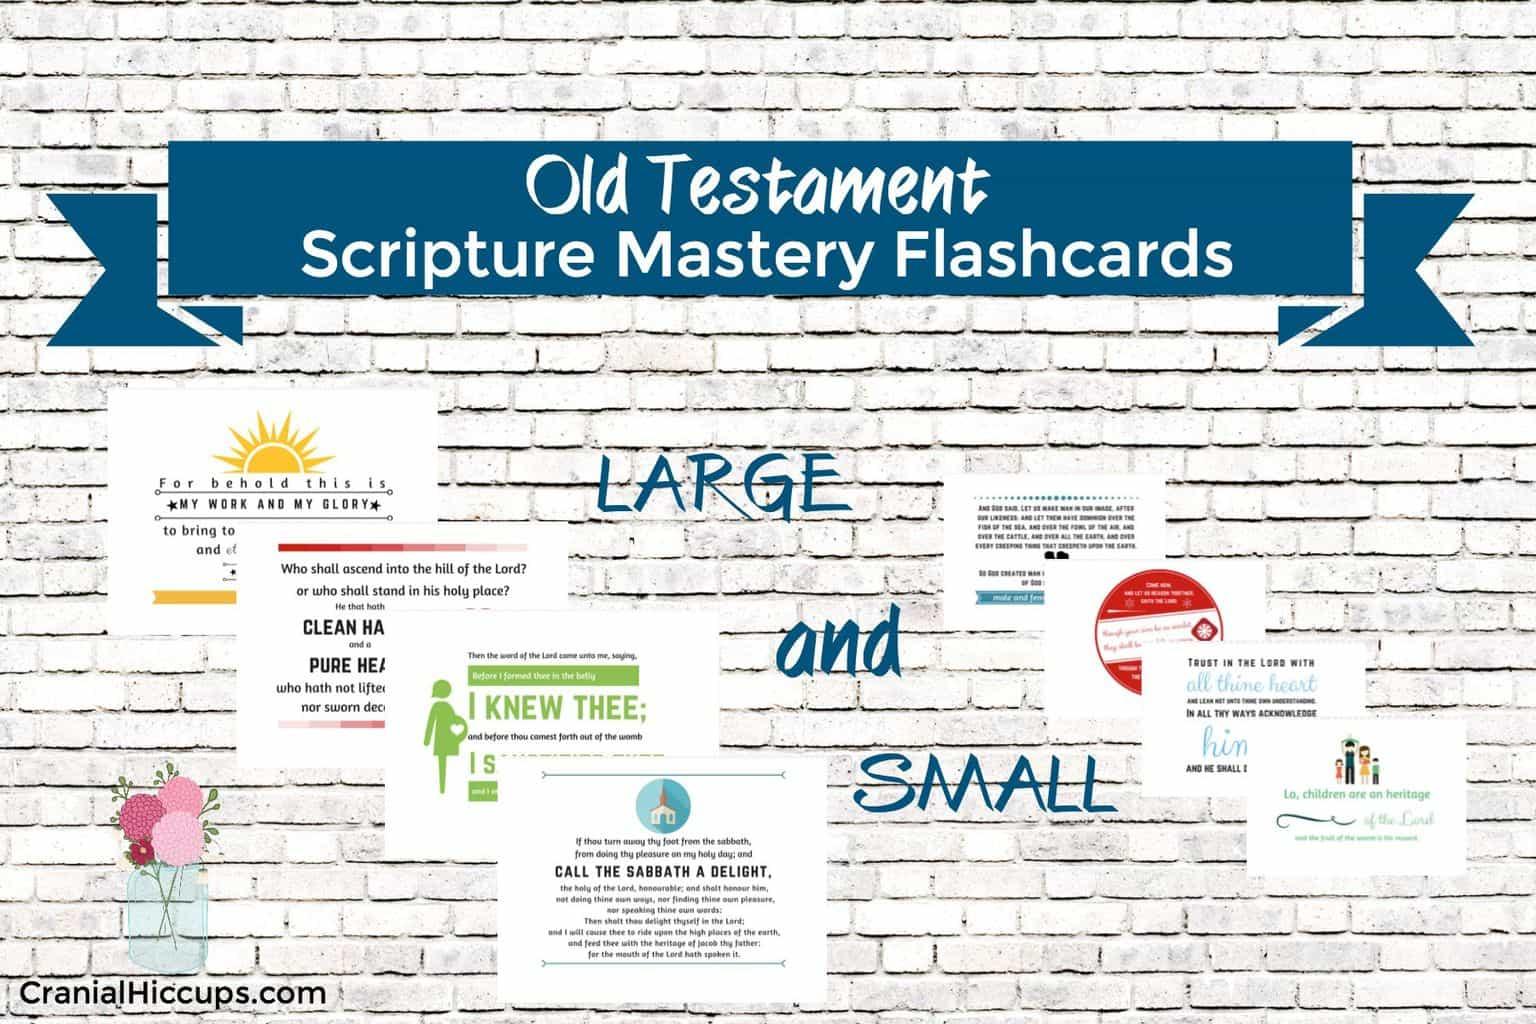 Old Testament Pseudepigrapha Ivrejected Scriptures